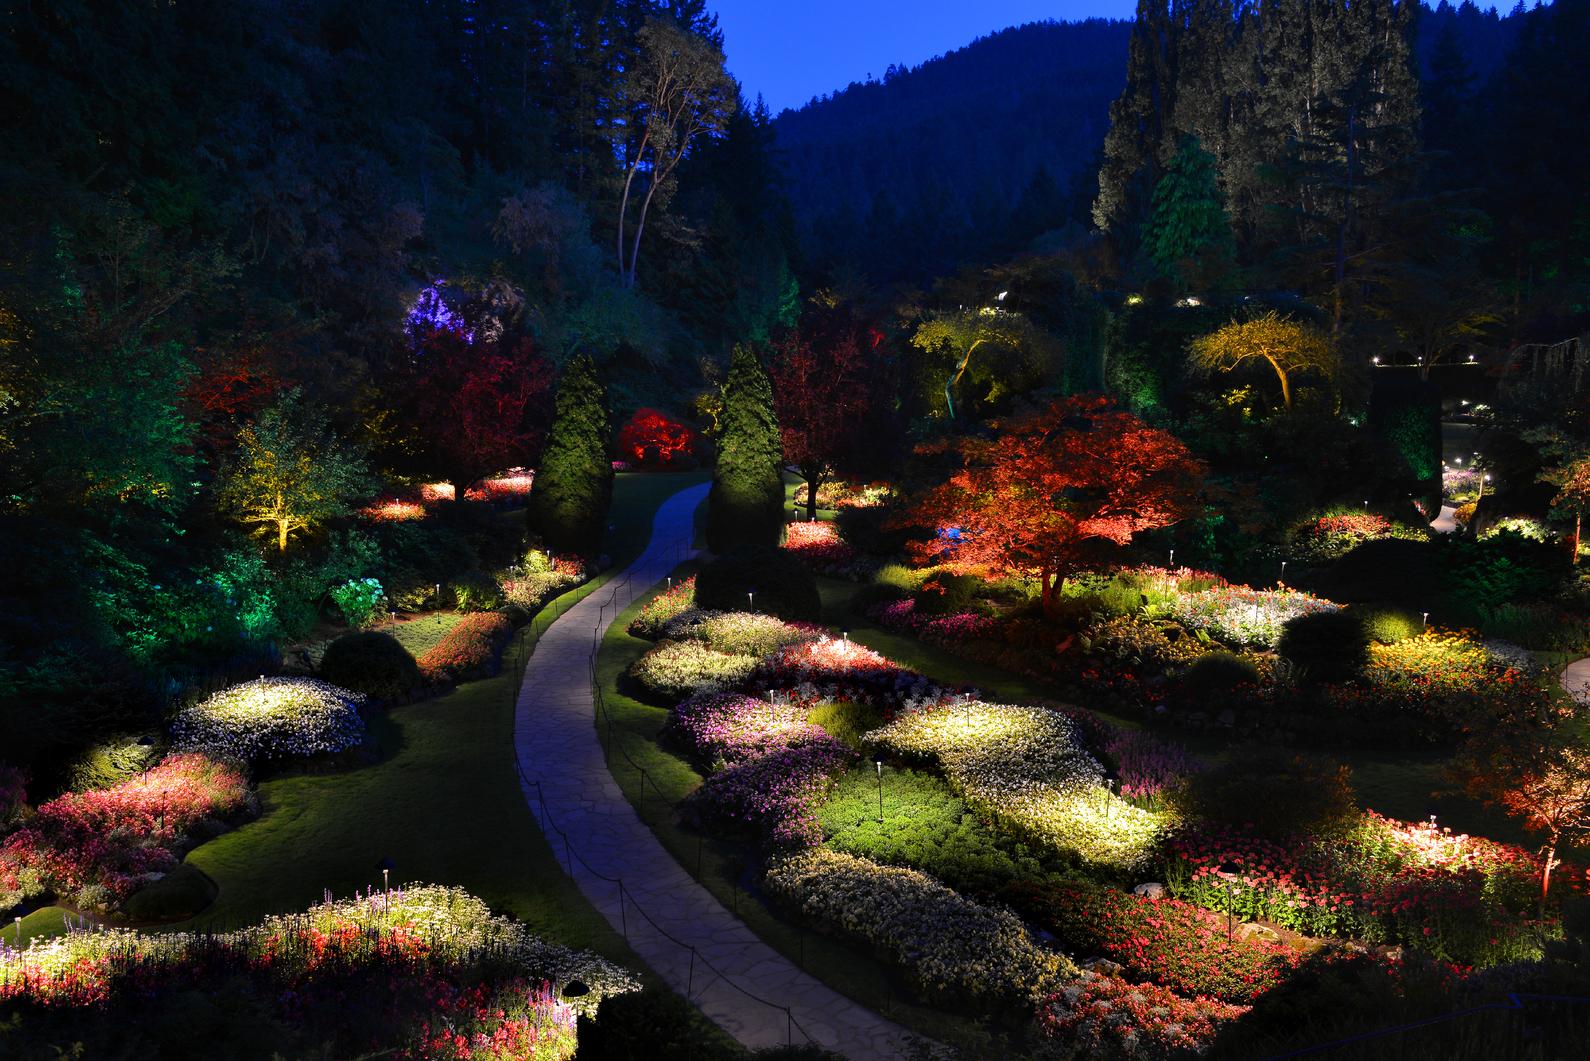 Night Illumination at The Butchart Gardens